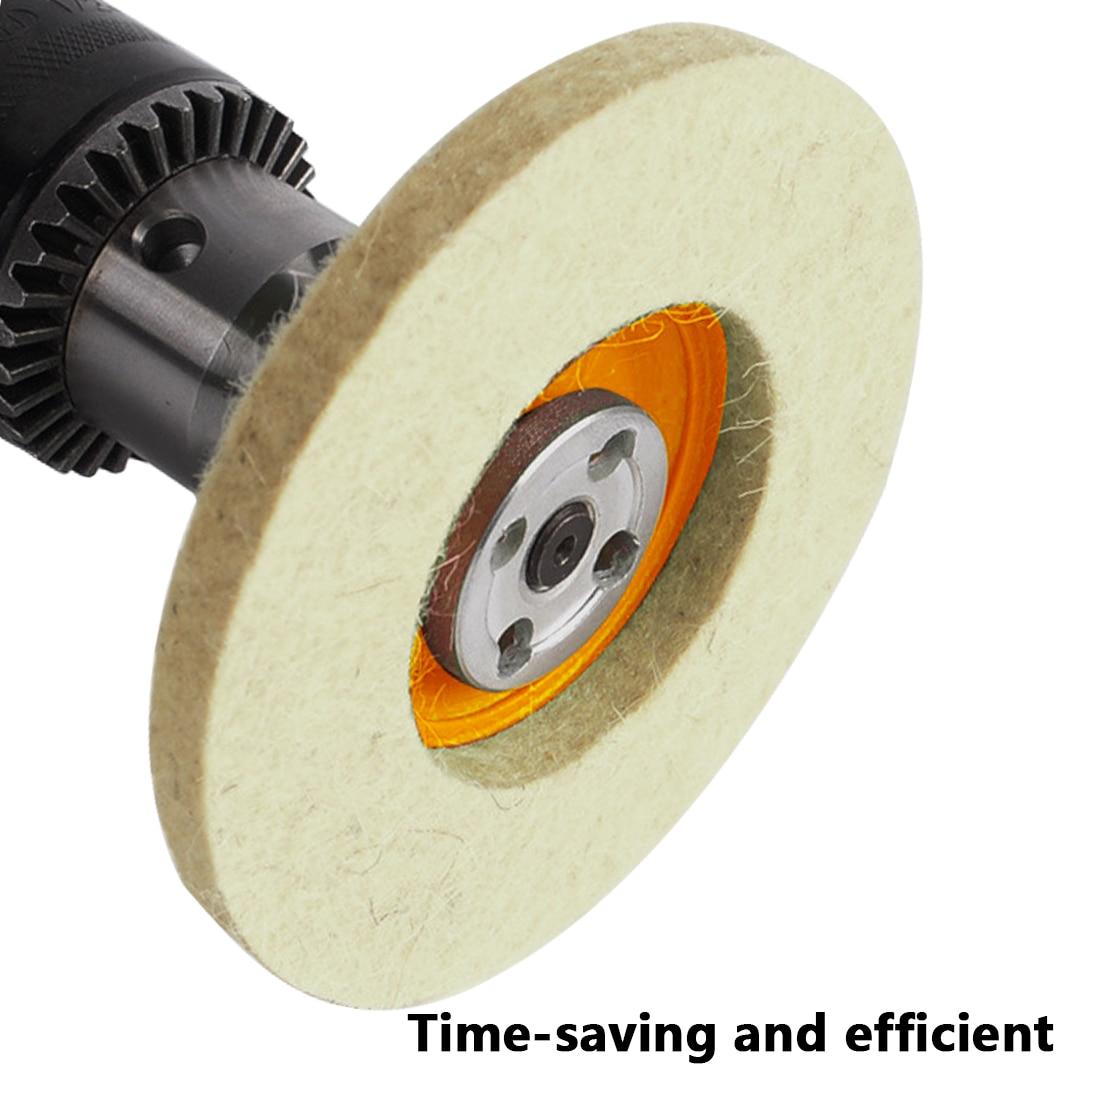 3Pcs  4'' 100mm Polishing Pad Wool Buffing Angle Wheel Grinder Felt Polishing Disc For Rotary Tool Abrasive Grinding Wheel